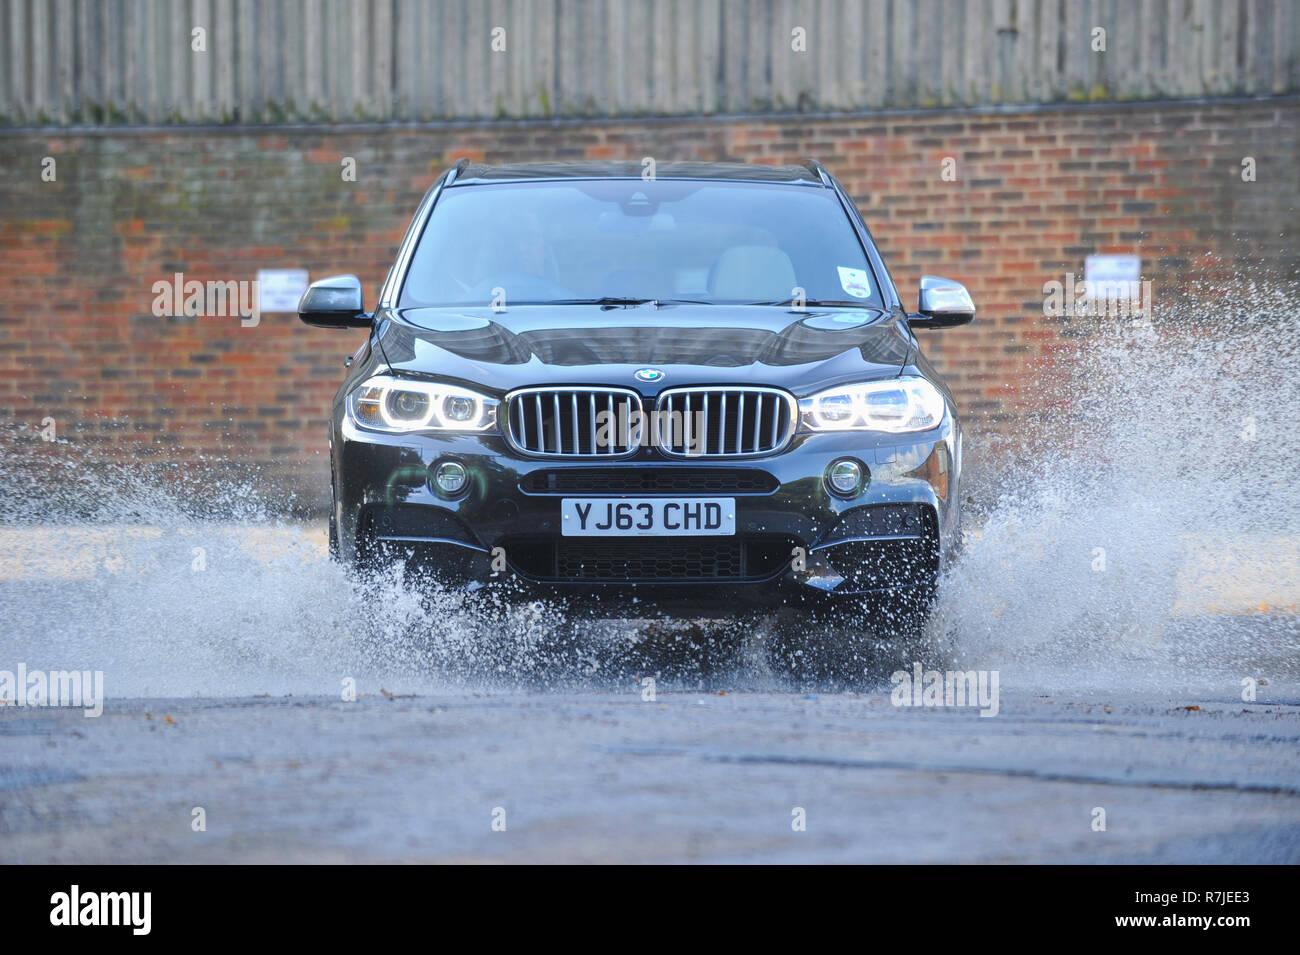 2013 BMW X5 M50d German performance SUV - Stock Image